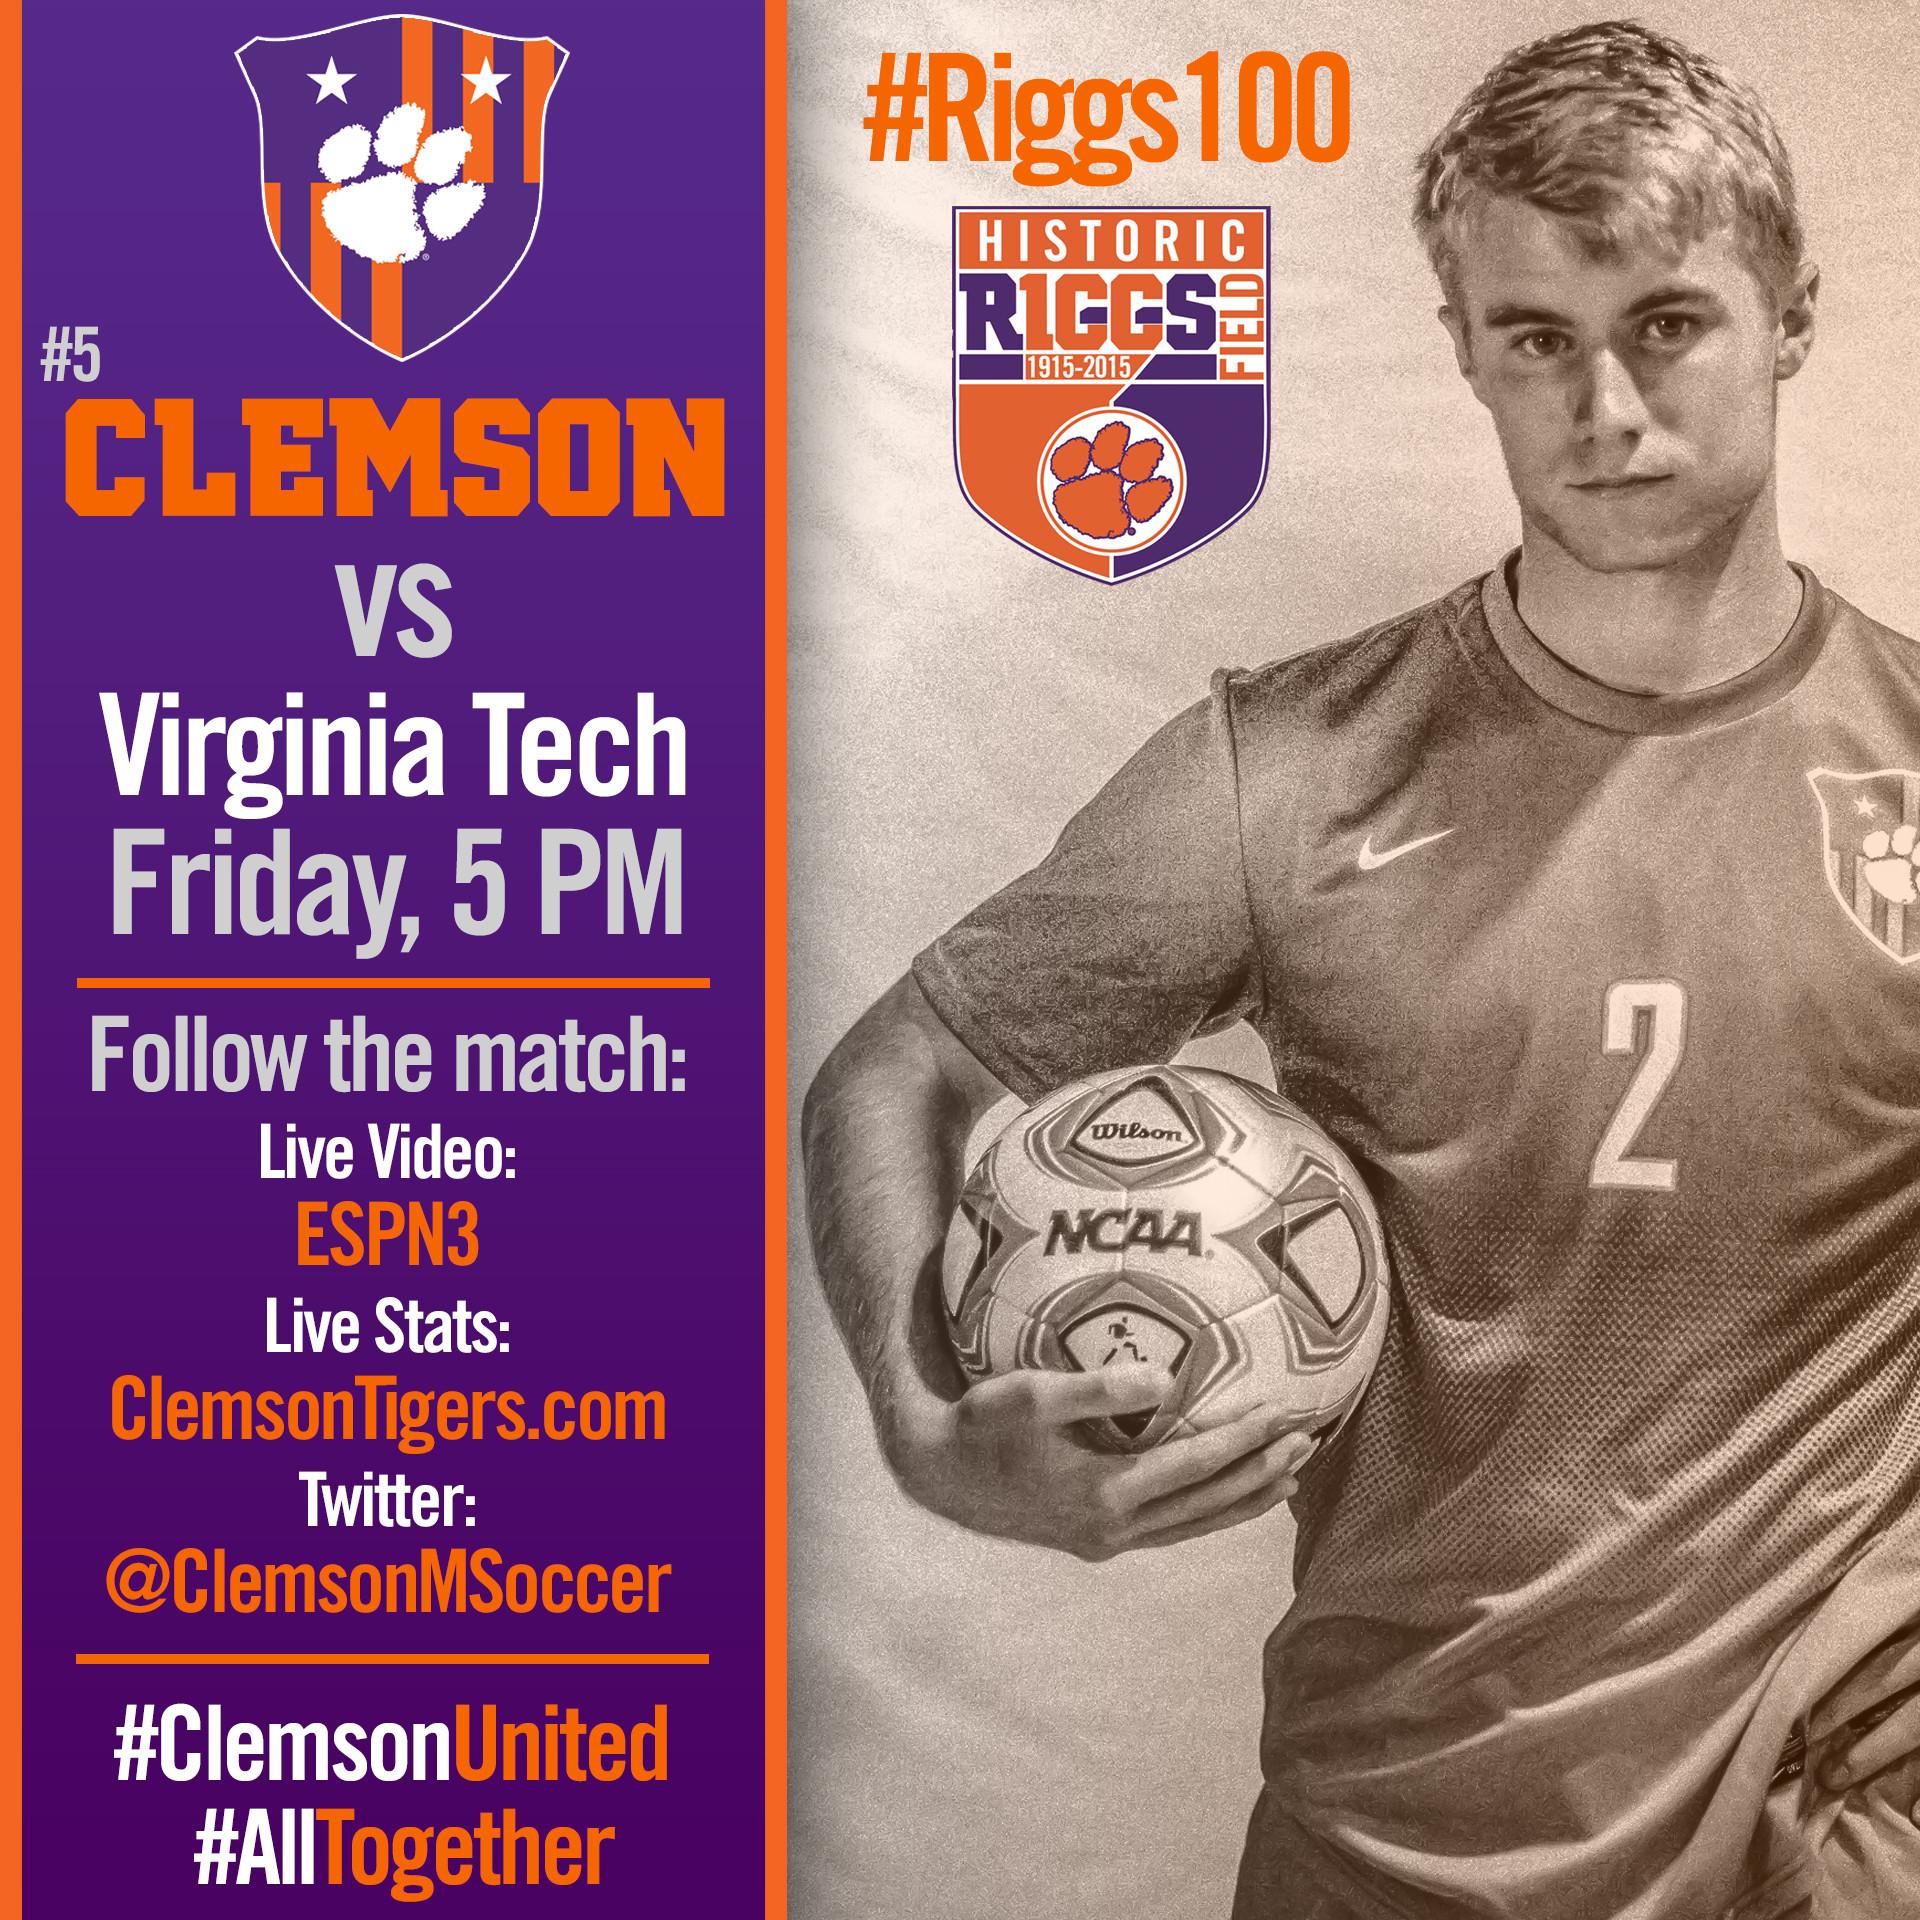 No. 5 Clemson Faces Virginia Tech in #Riggs100 Celebration Friday